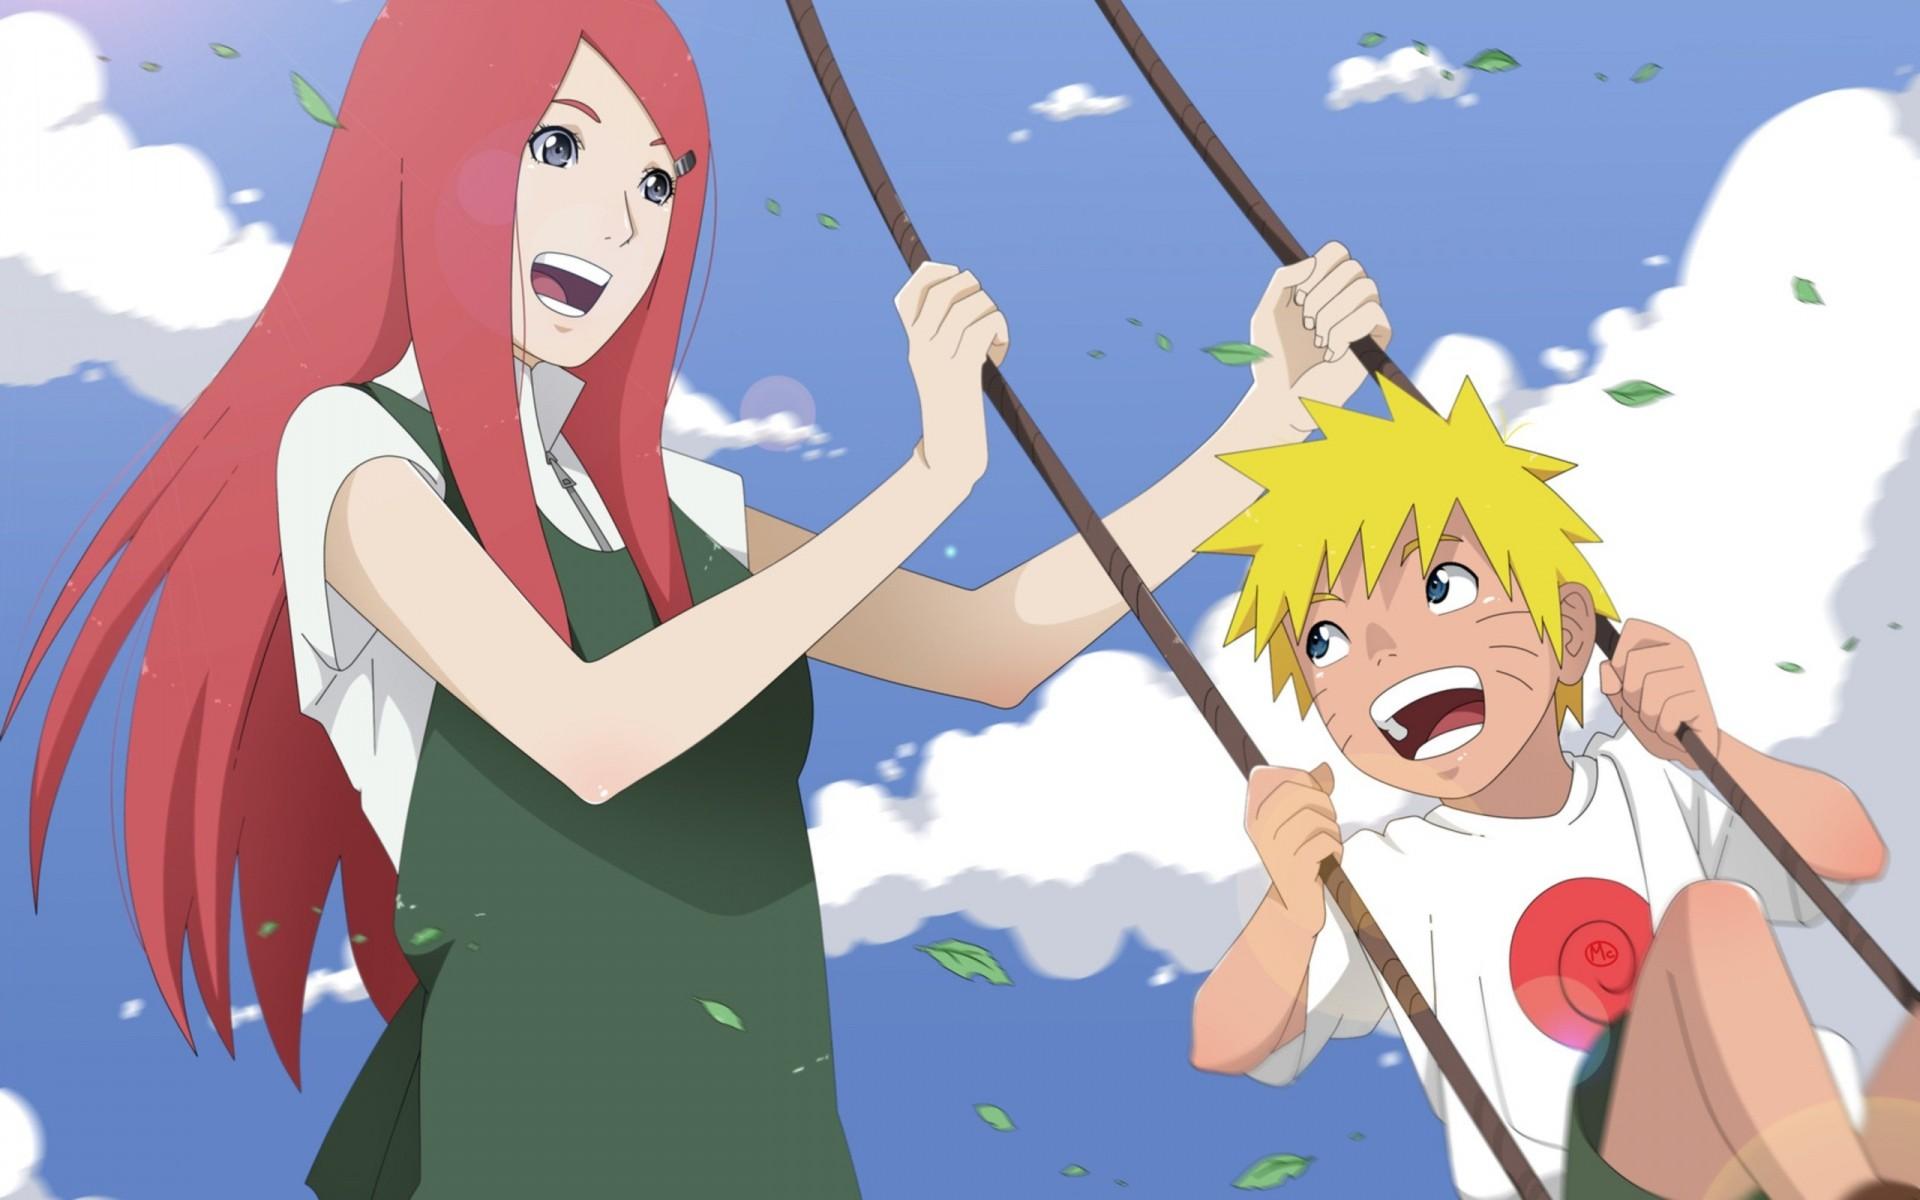 Wallpaper Ilustrasi Anime Manga Gambar Kartun Naruto Shippuuden Uzumaki Ayunan